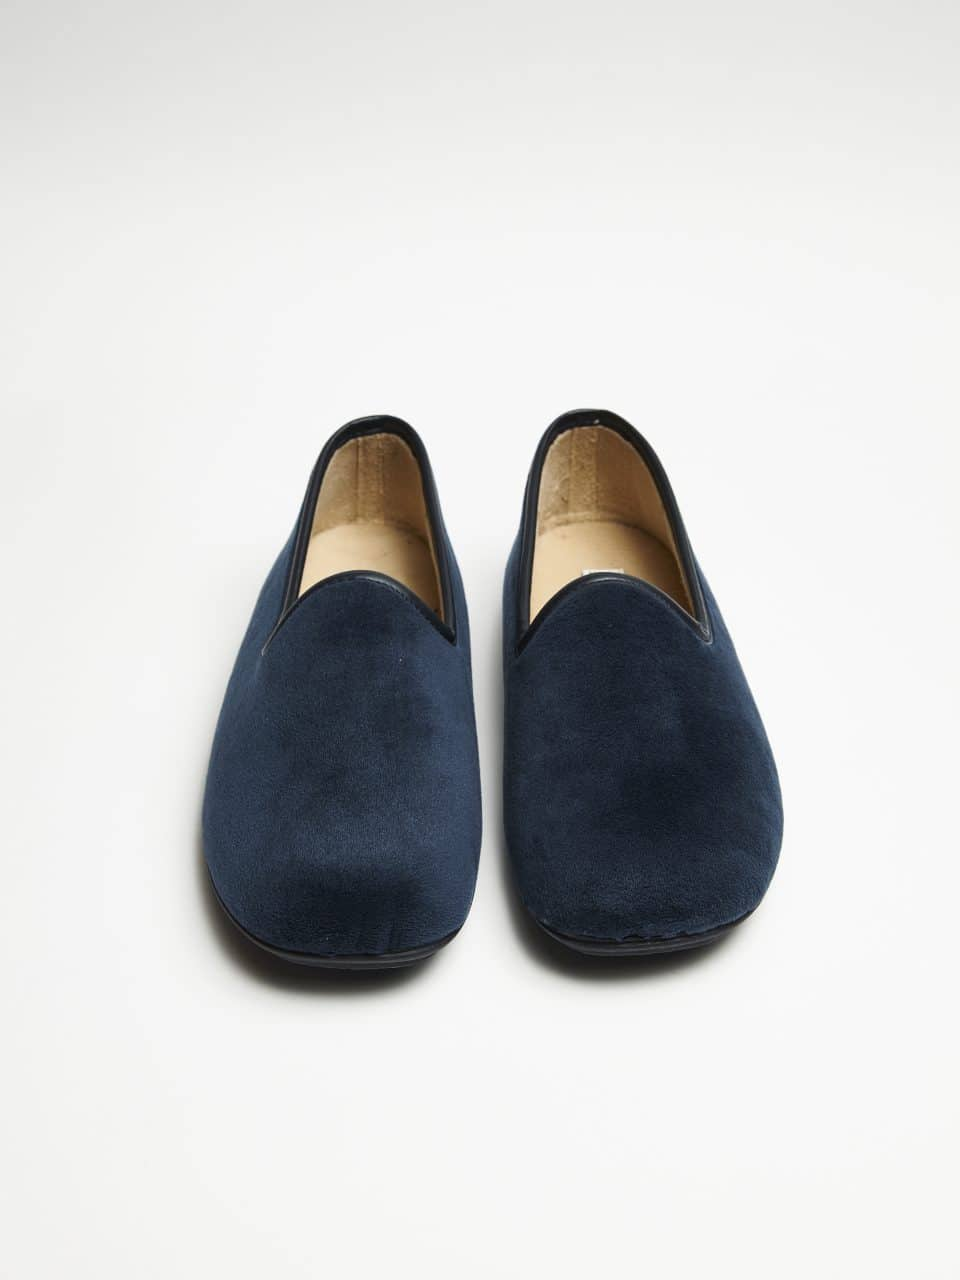 ALASKA MARINO Marcas en Loyna Shoes